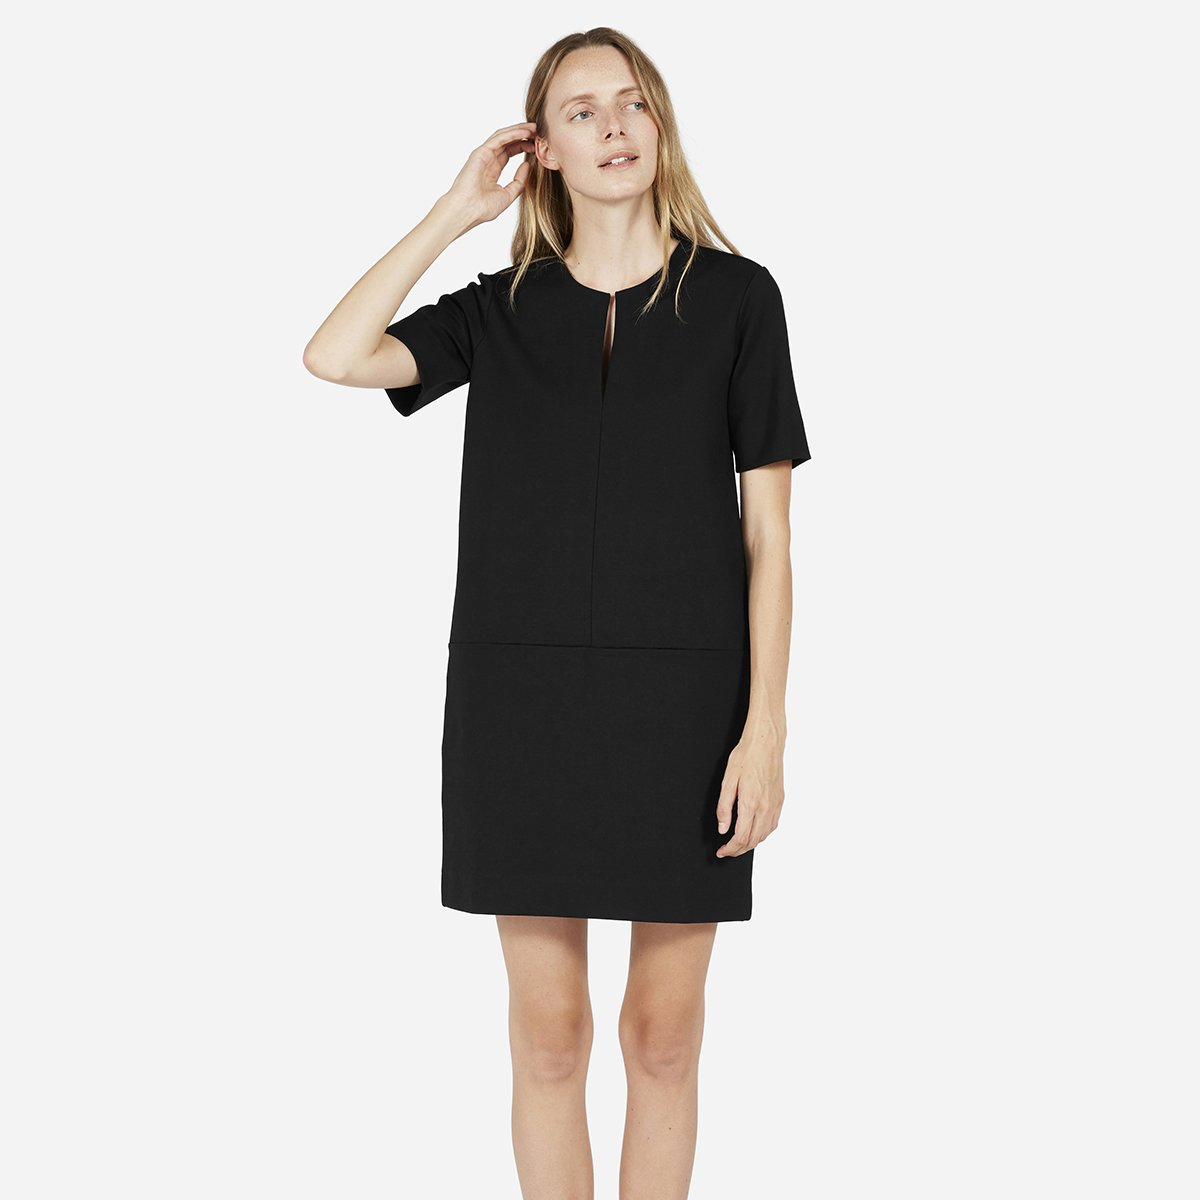 683fa2f56763a The Ponte Short-Sleeve Dress